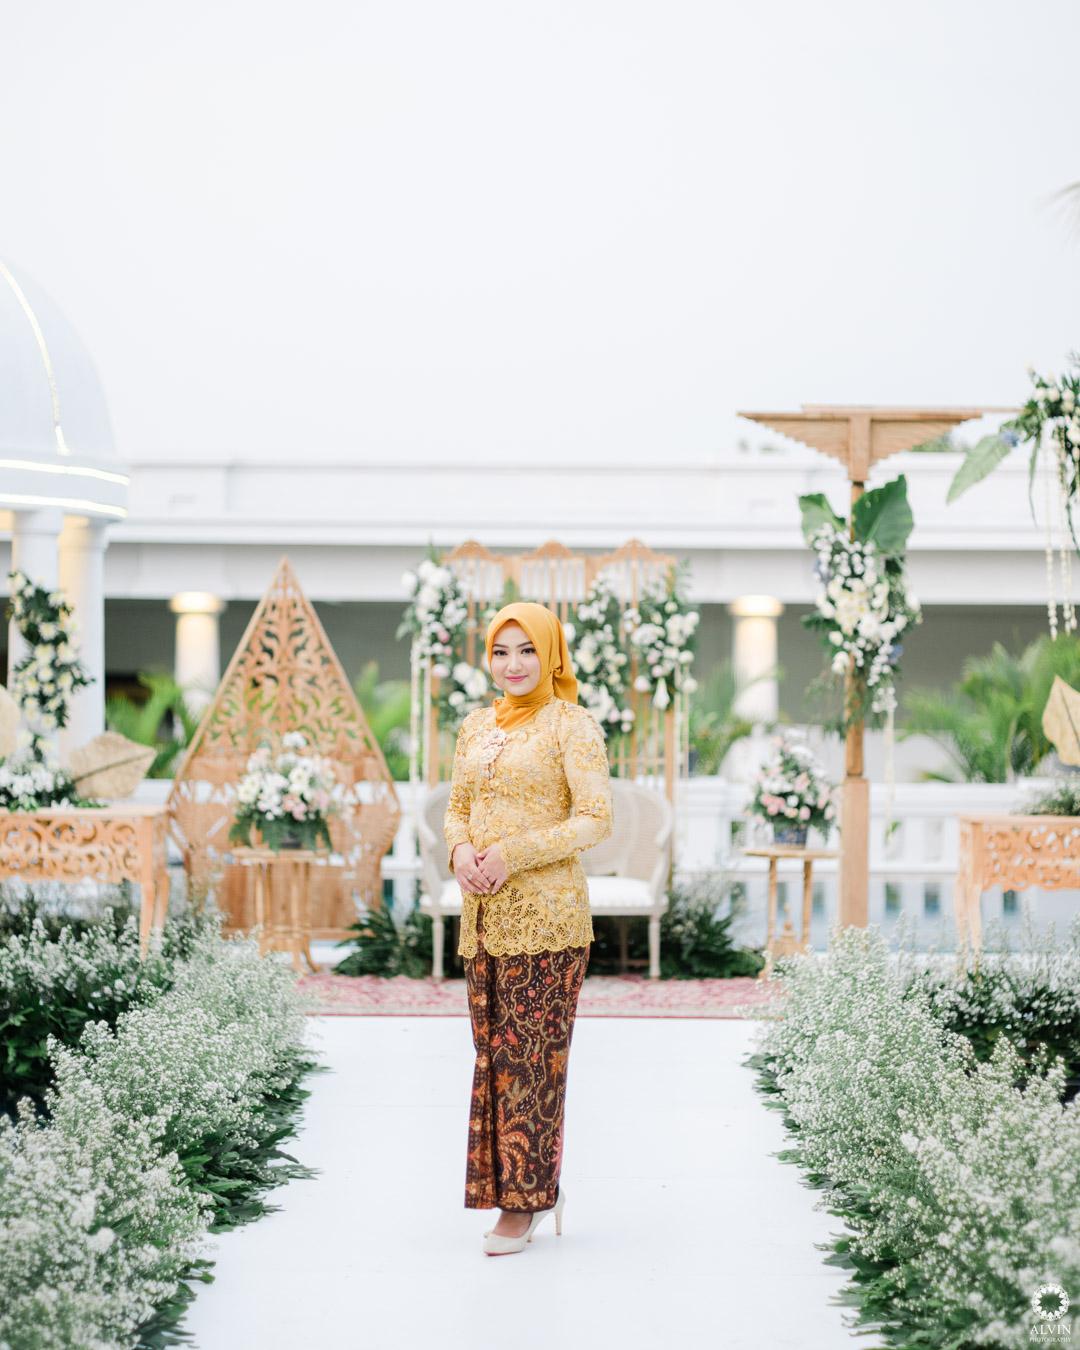 DSCF1388 : Bella & Fahmi Wedding